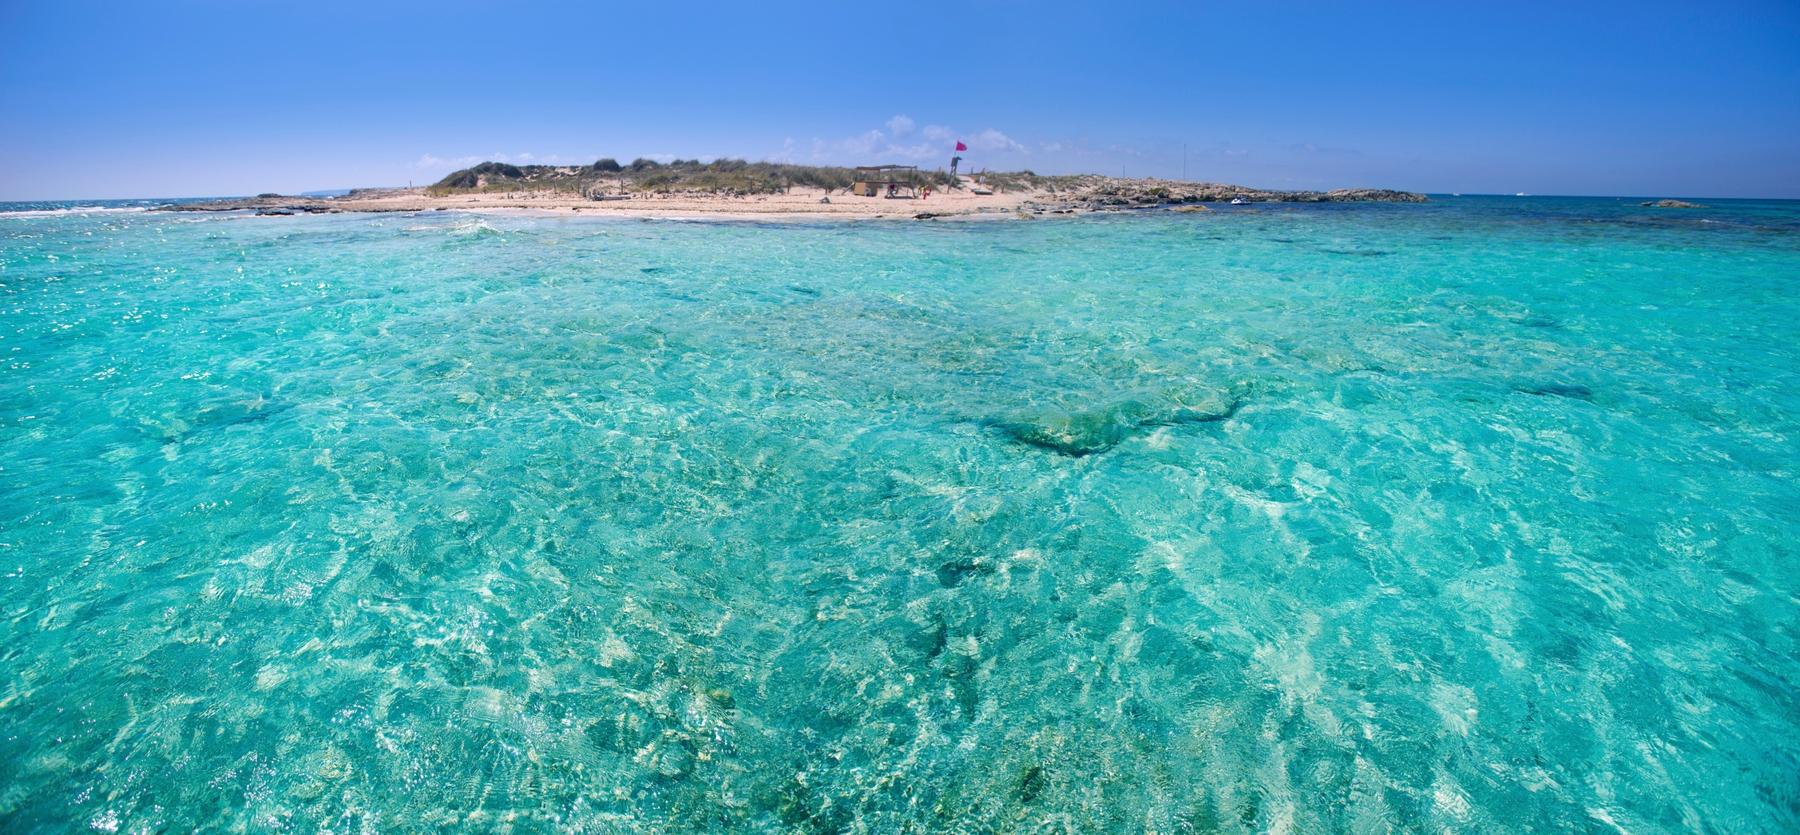 Spiagge Formentera: S'Espalmador